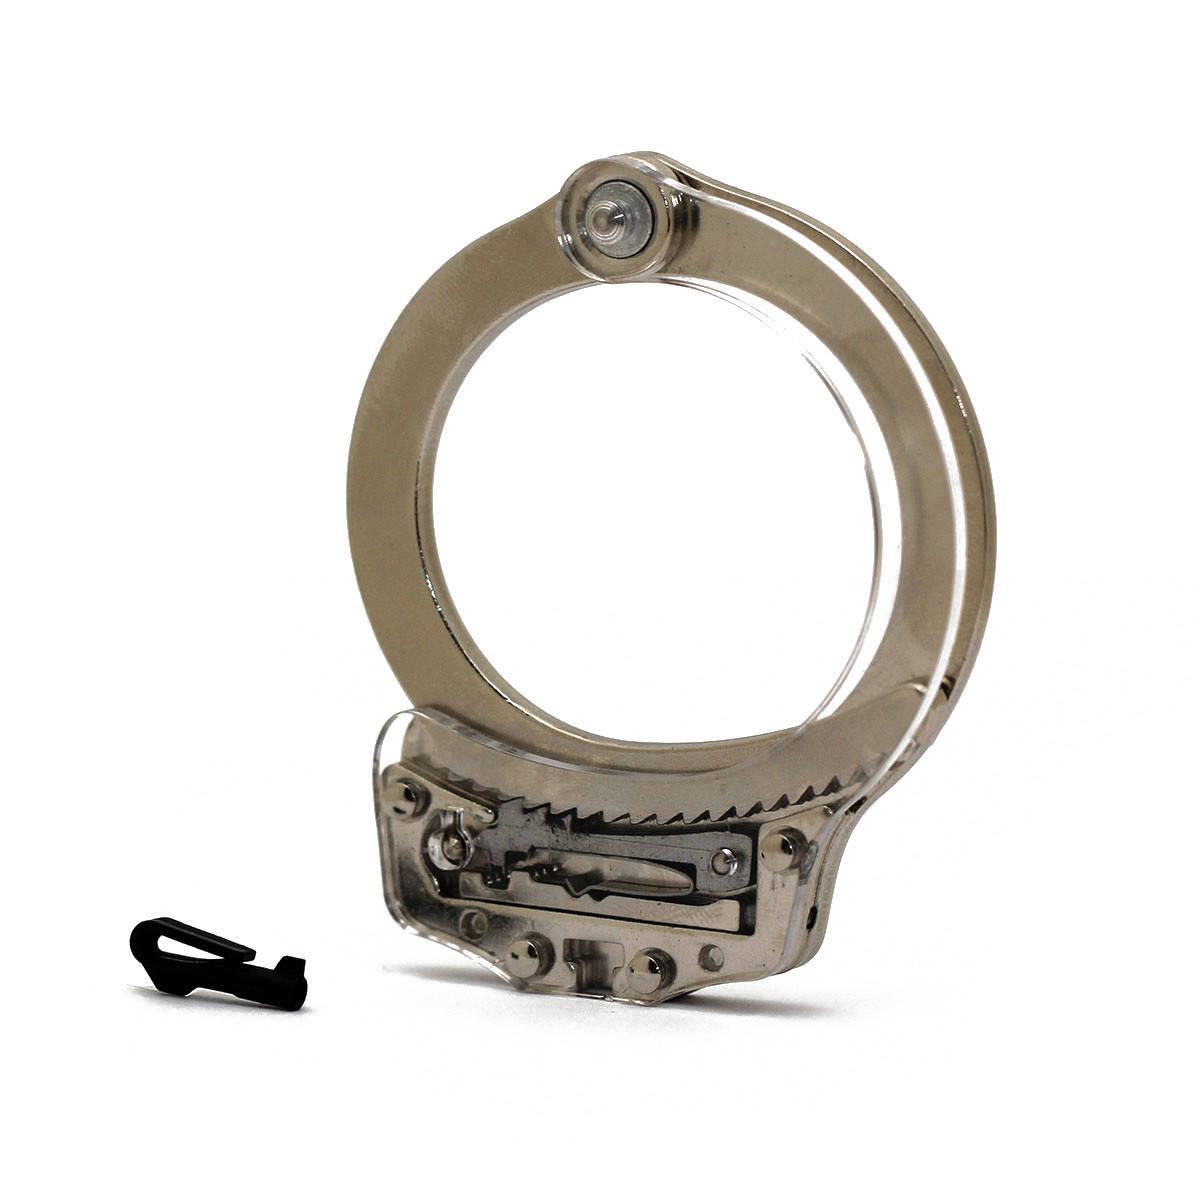 Review: Handcuff Trainer Shomer-Tec